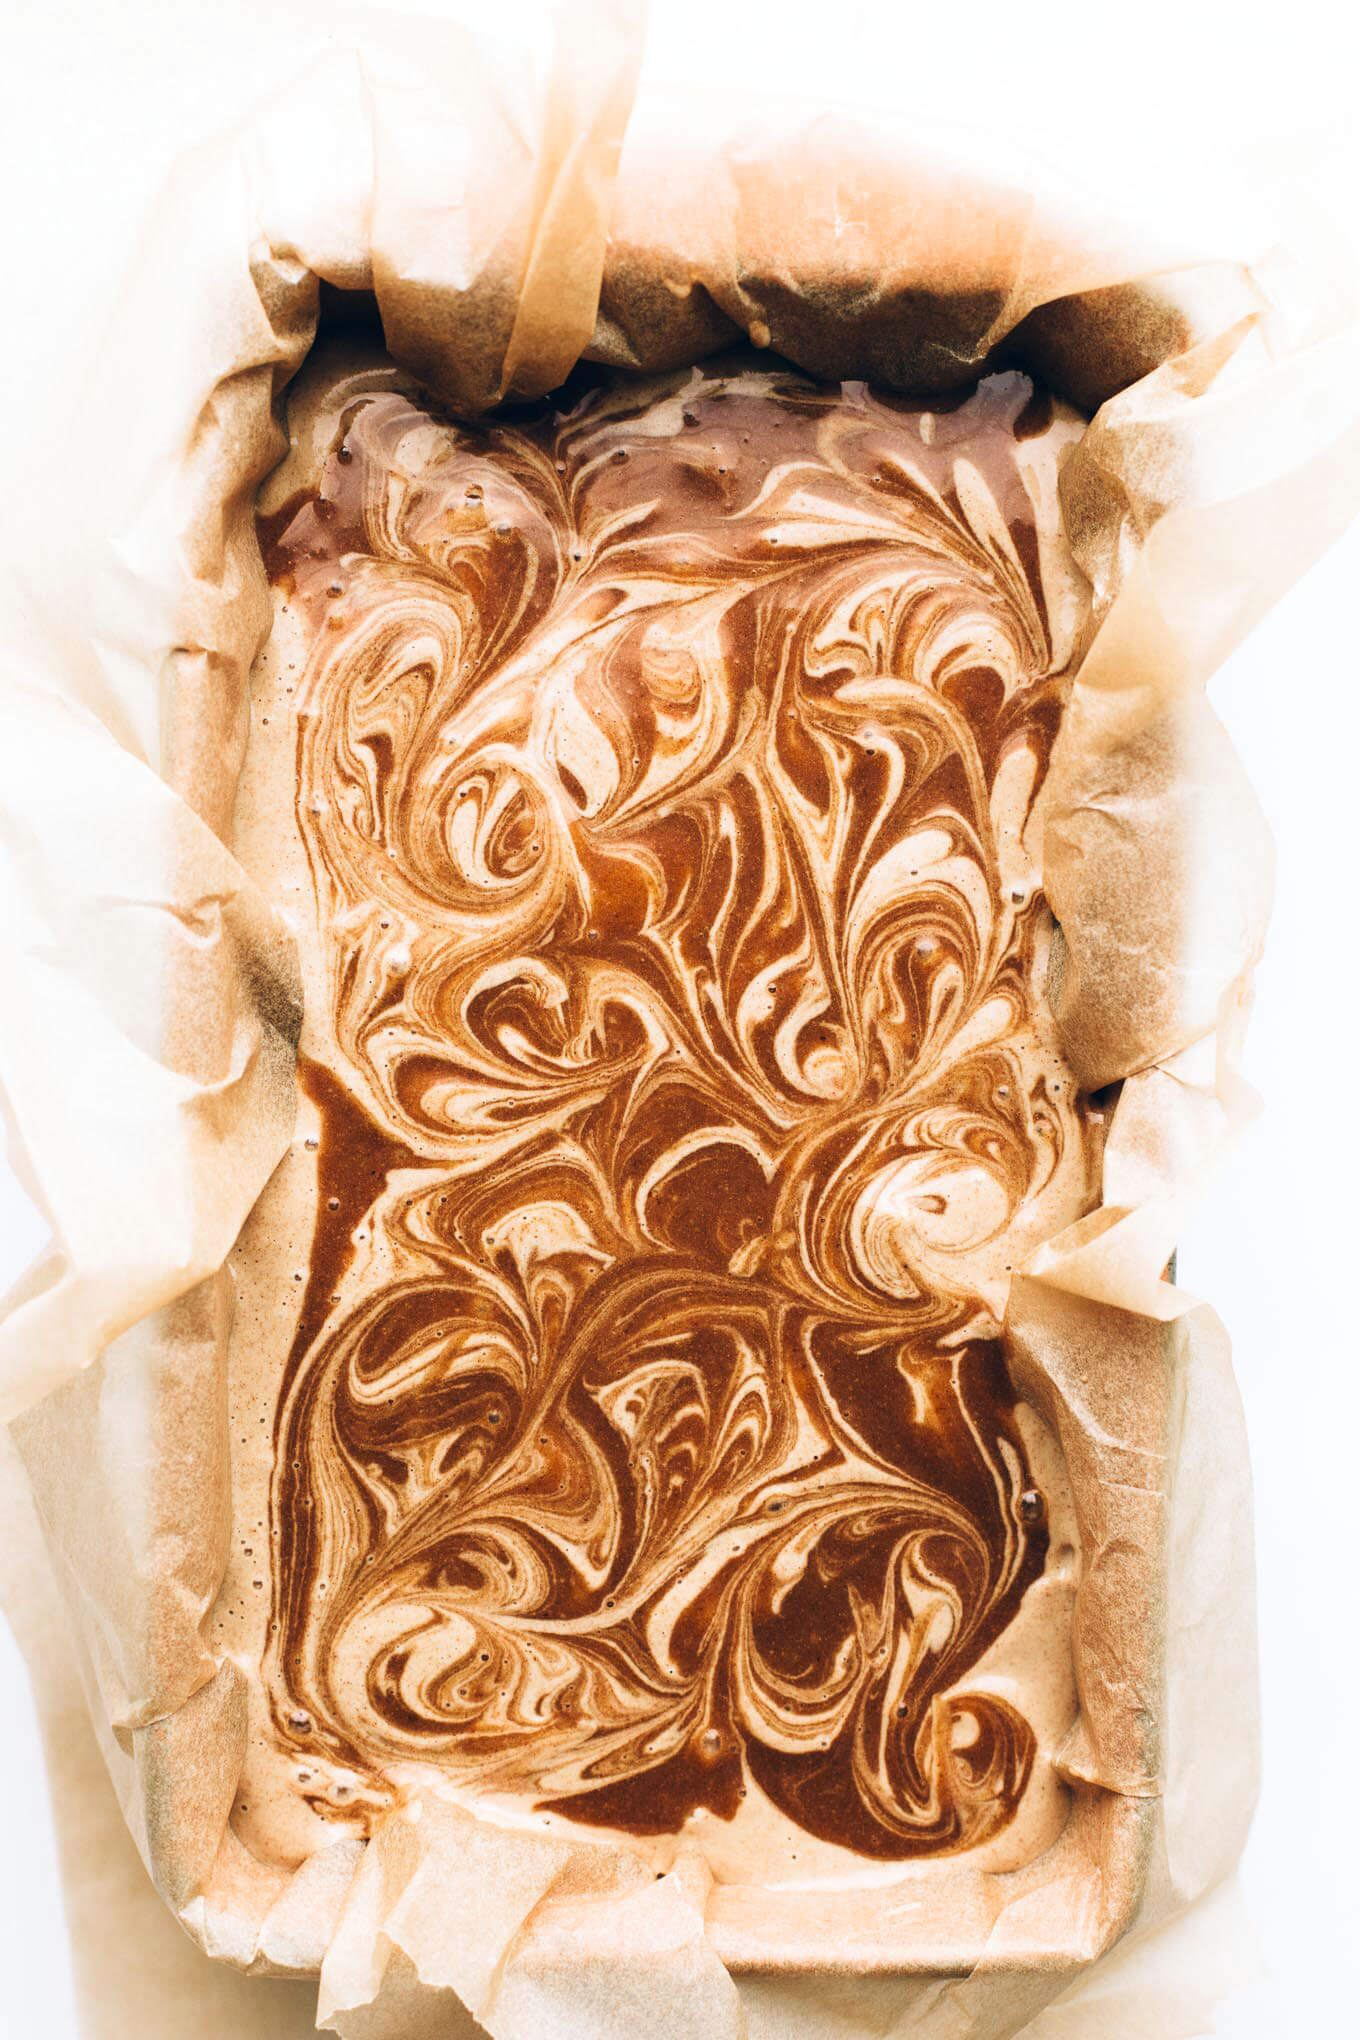 Vegan No-Churn Cinnamon Roll Ice Cream